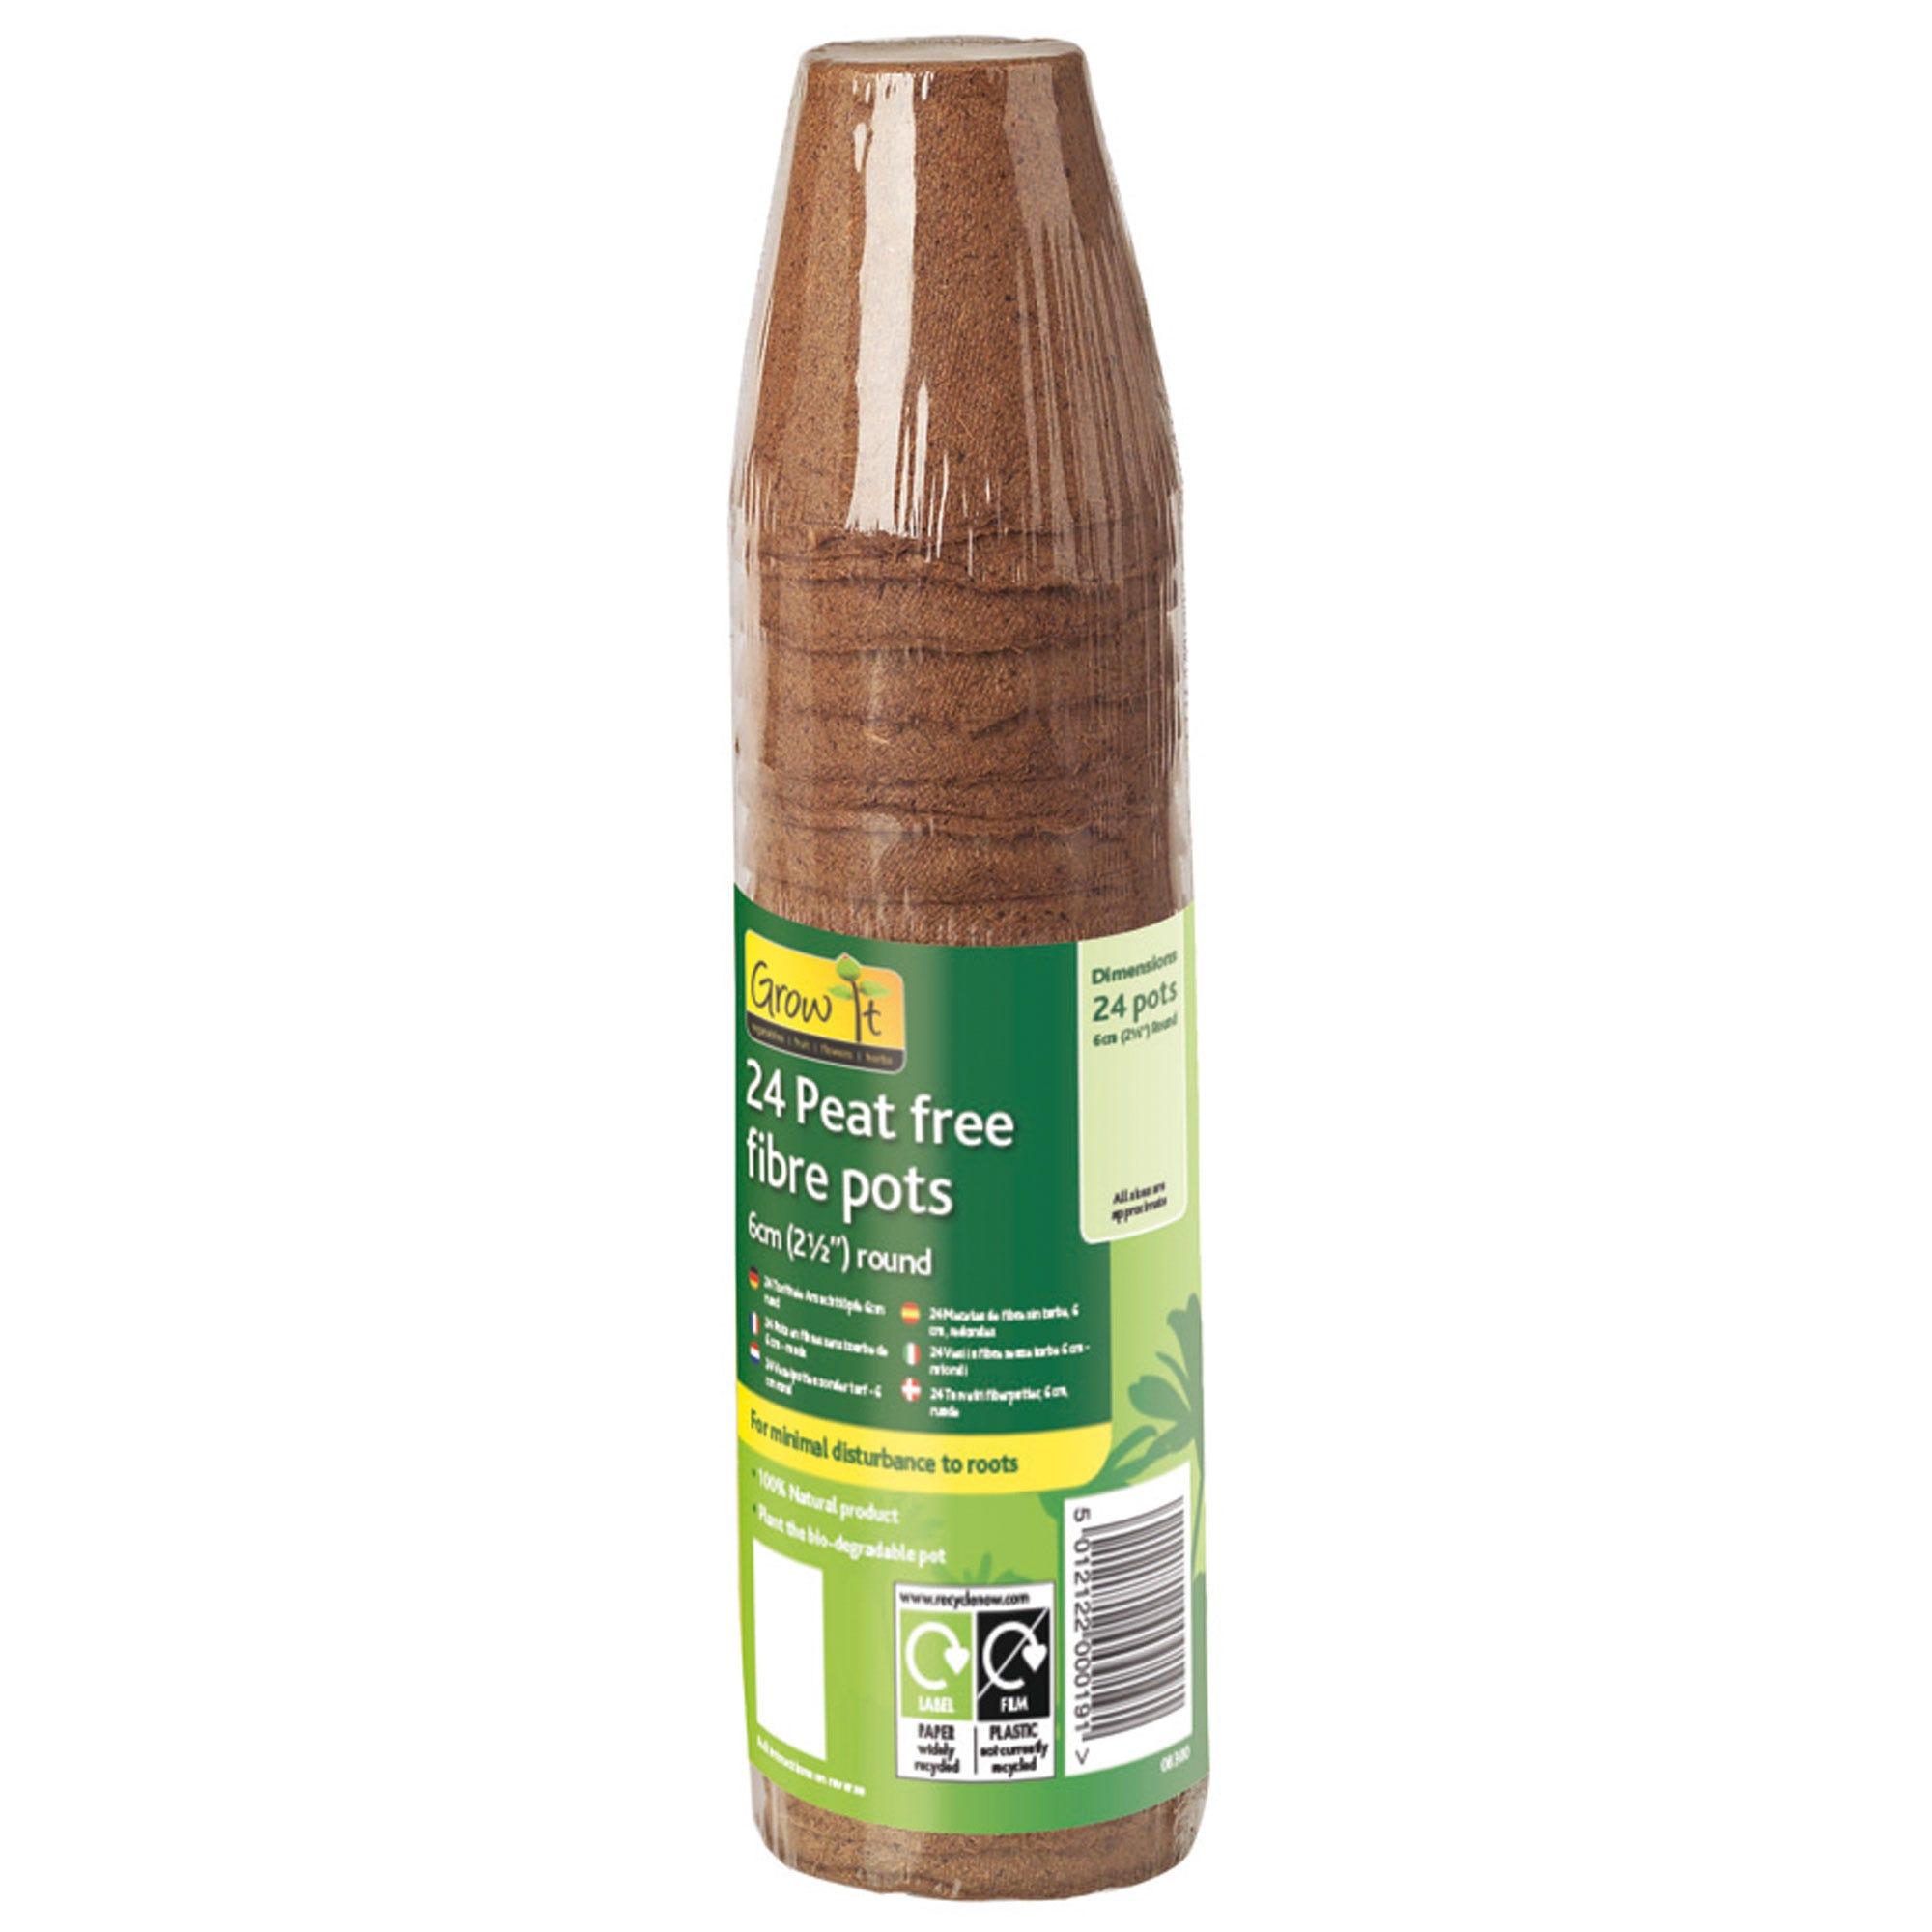 Compare prices for Gardman Peat-Free Fibre Pots - 24 Pack